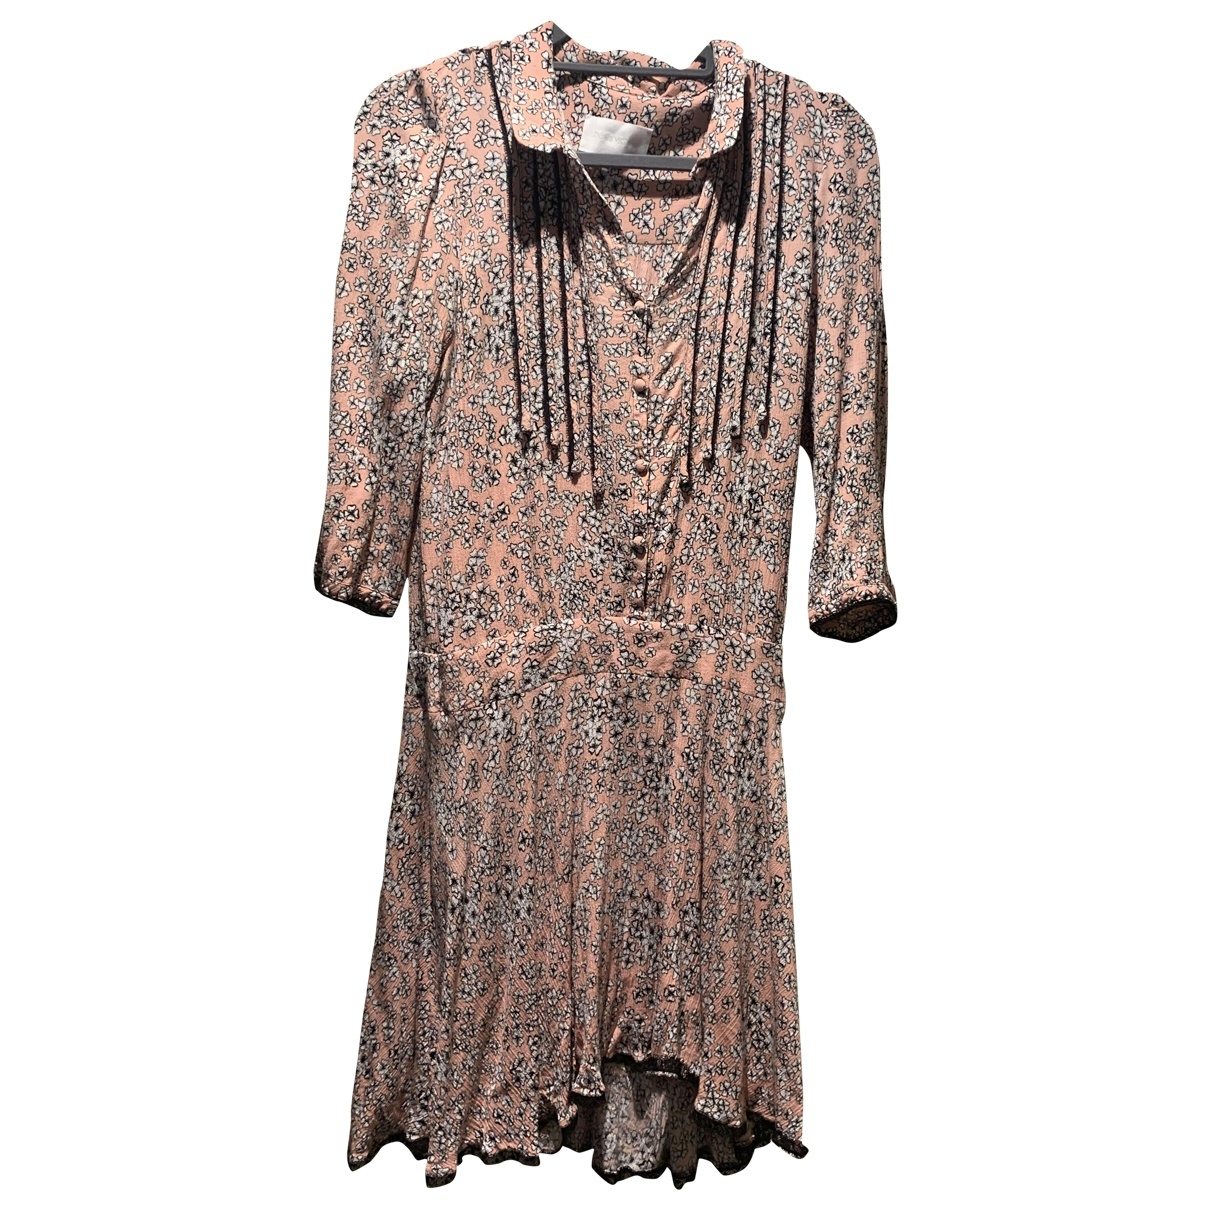 Zadig & Voltaire \N Multicolour Cotton dress for Women 38 FR